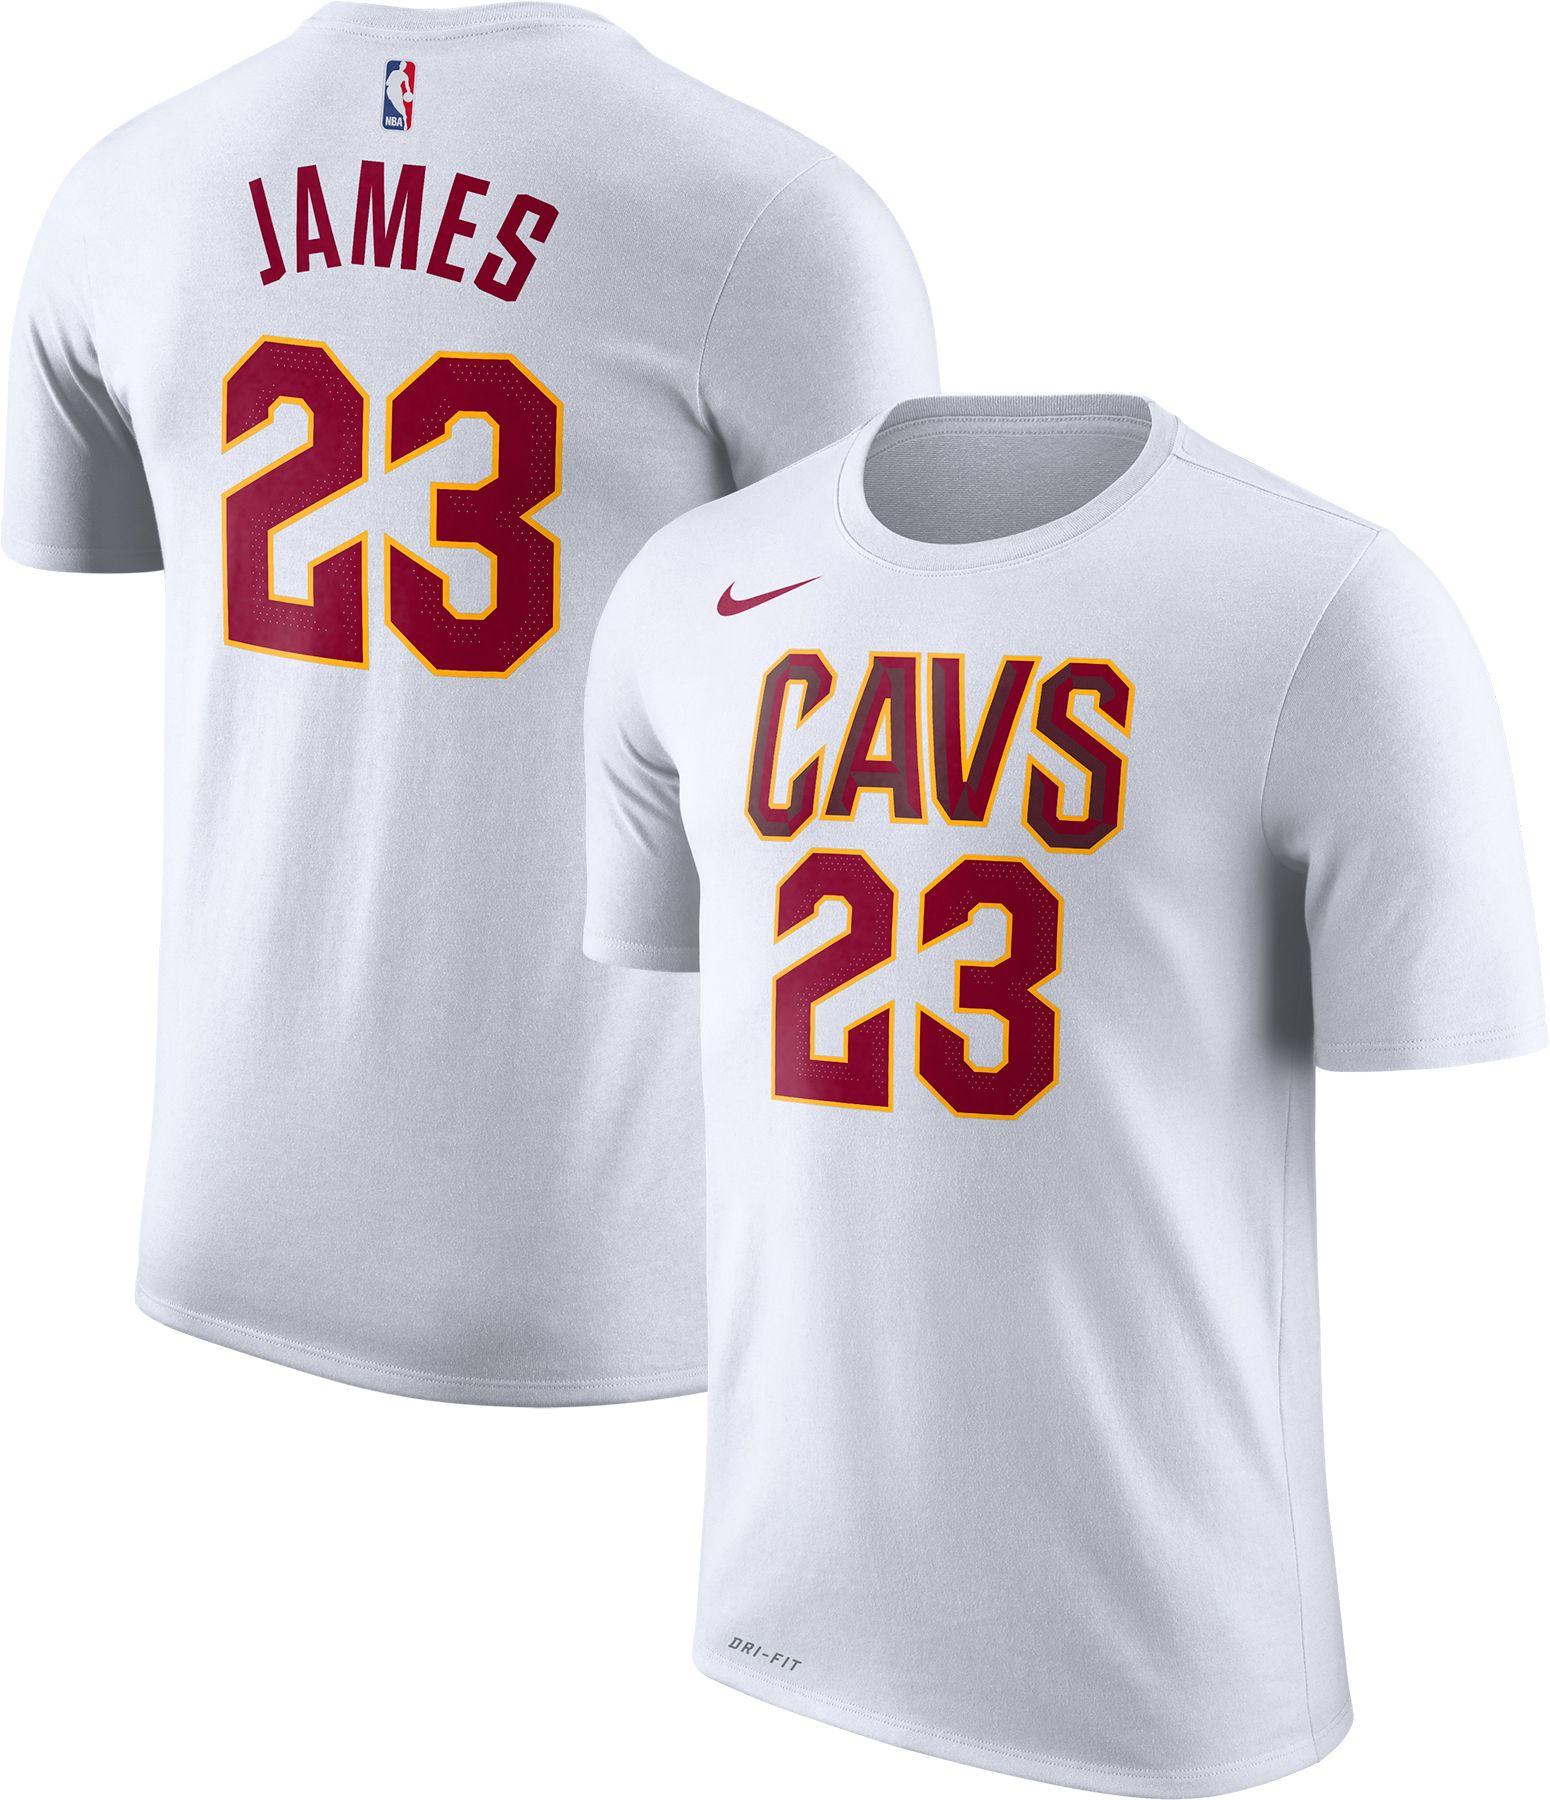 Nike Men's Cleveland Cavaliers LeBron James #23 Dri-FIT White T-Shirt |  DICK'S Sporting Goods